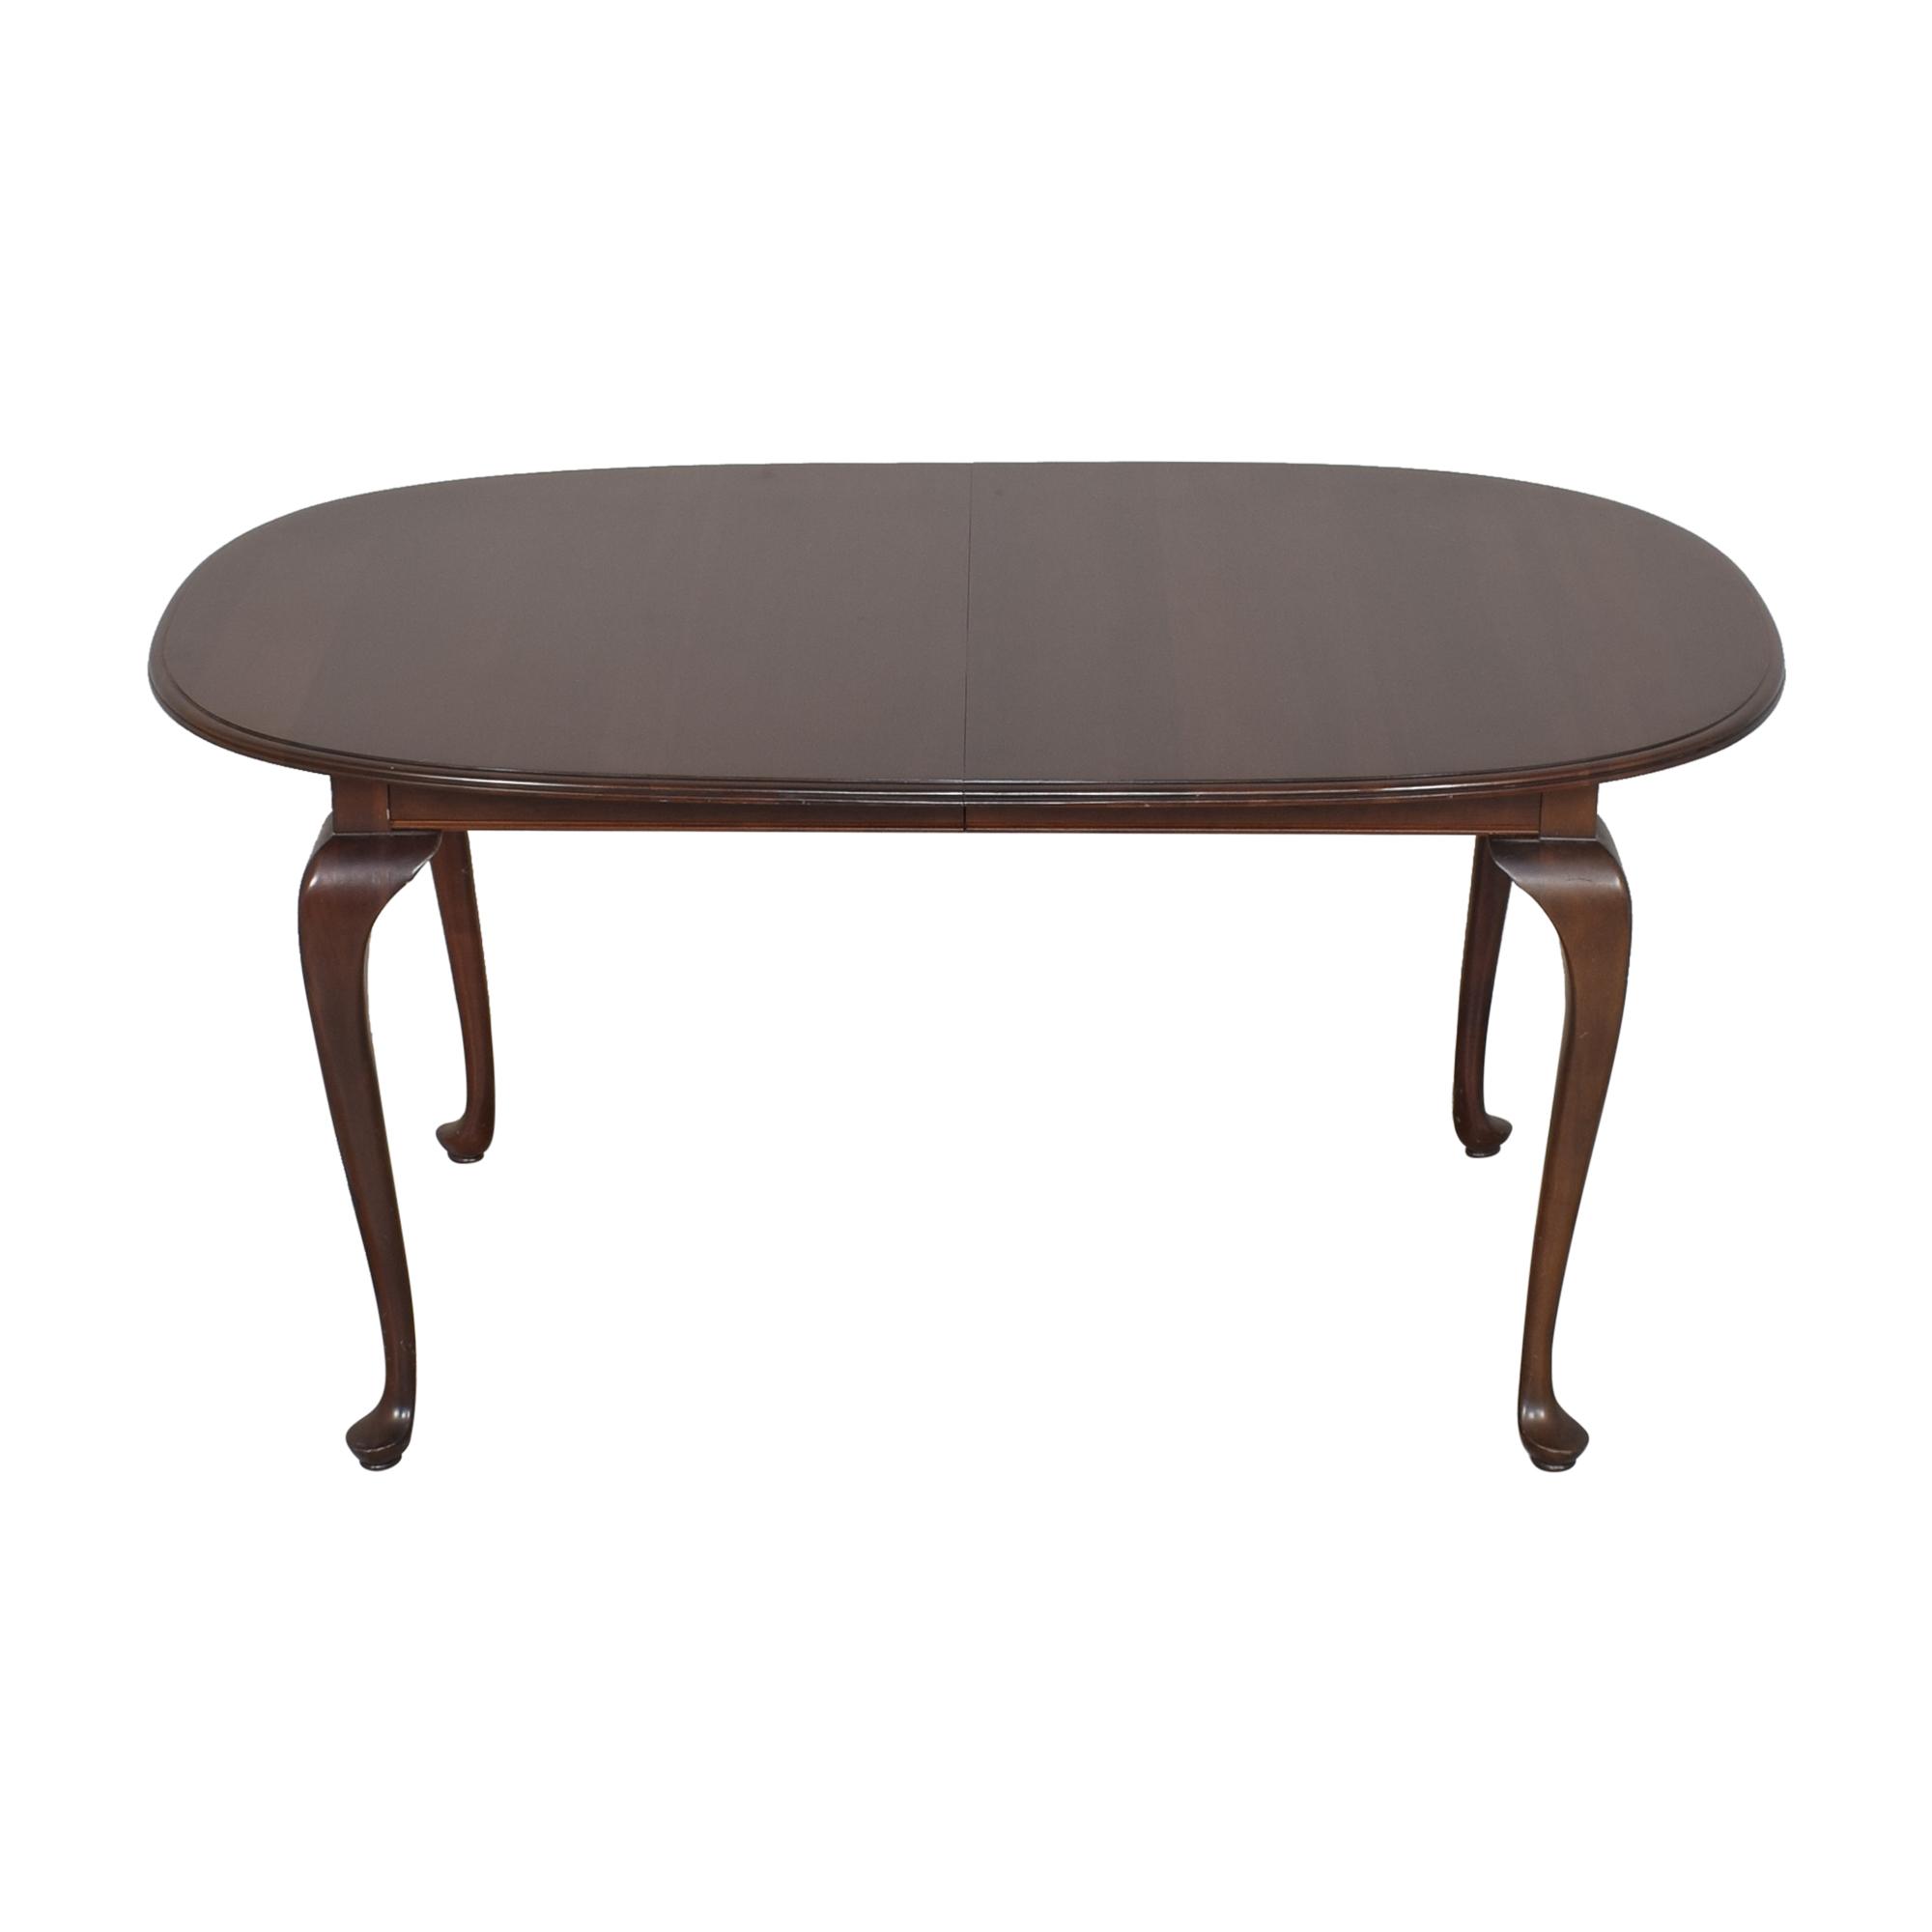 Ethan Allen Ethan Allen Georgian Court Oval Extendable Dining Table nj